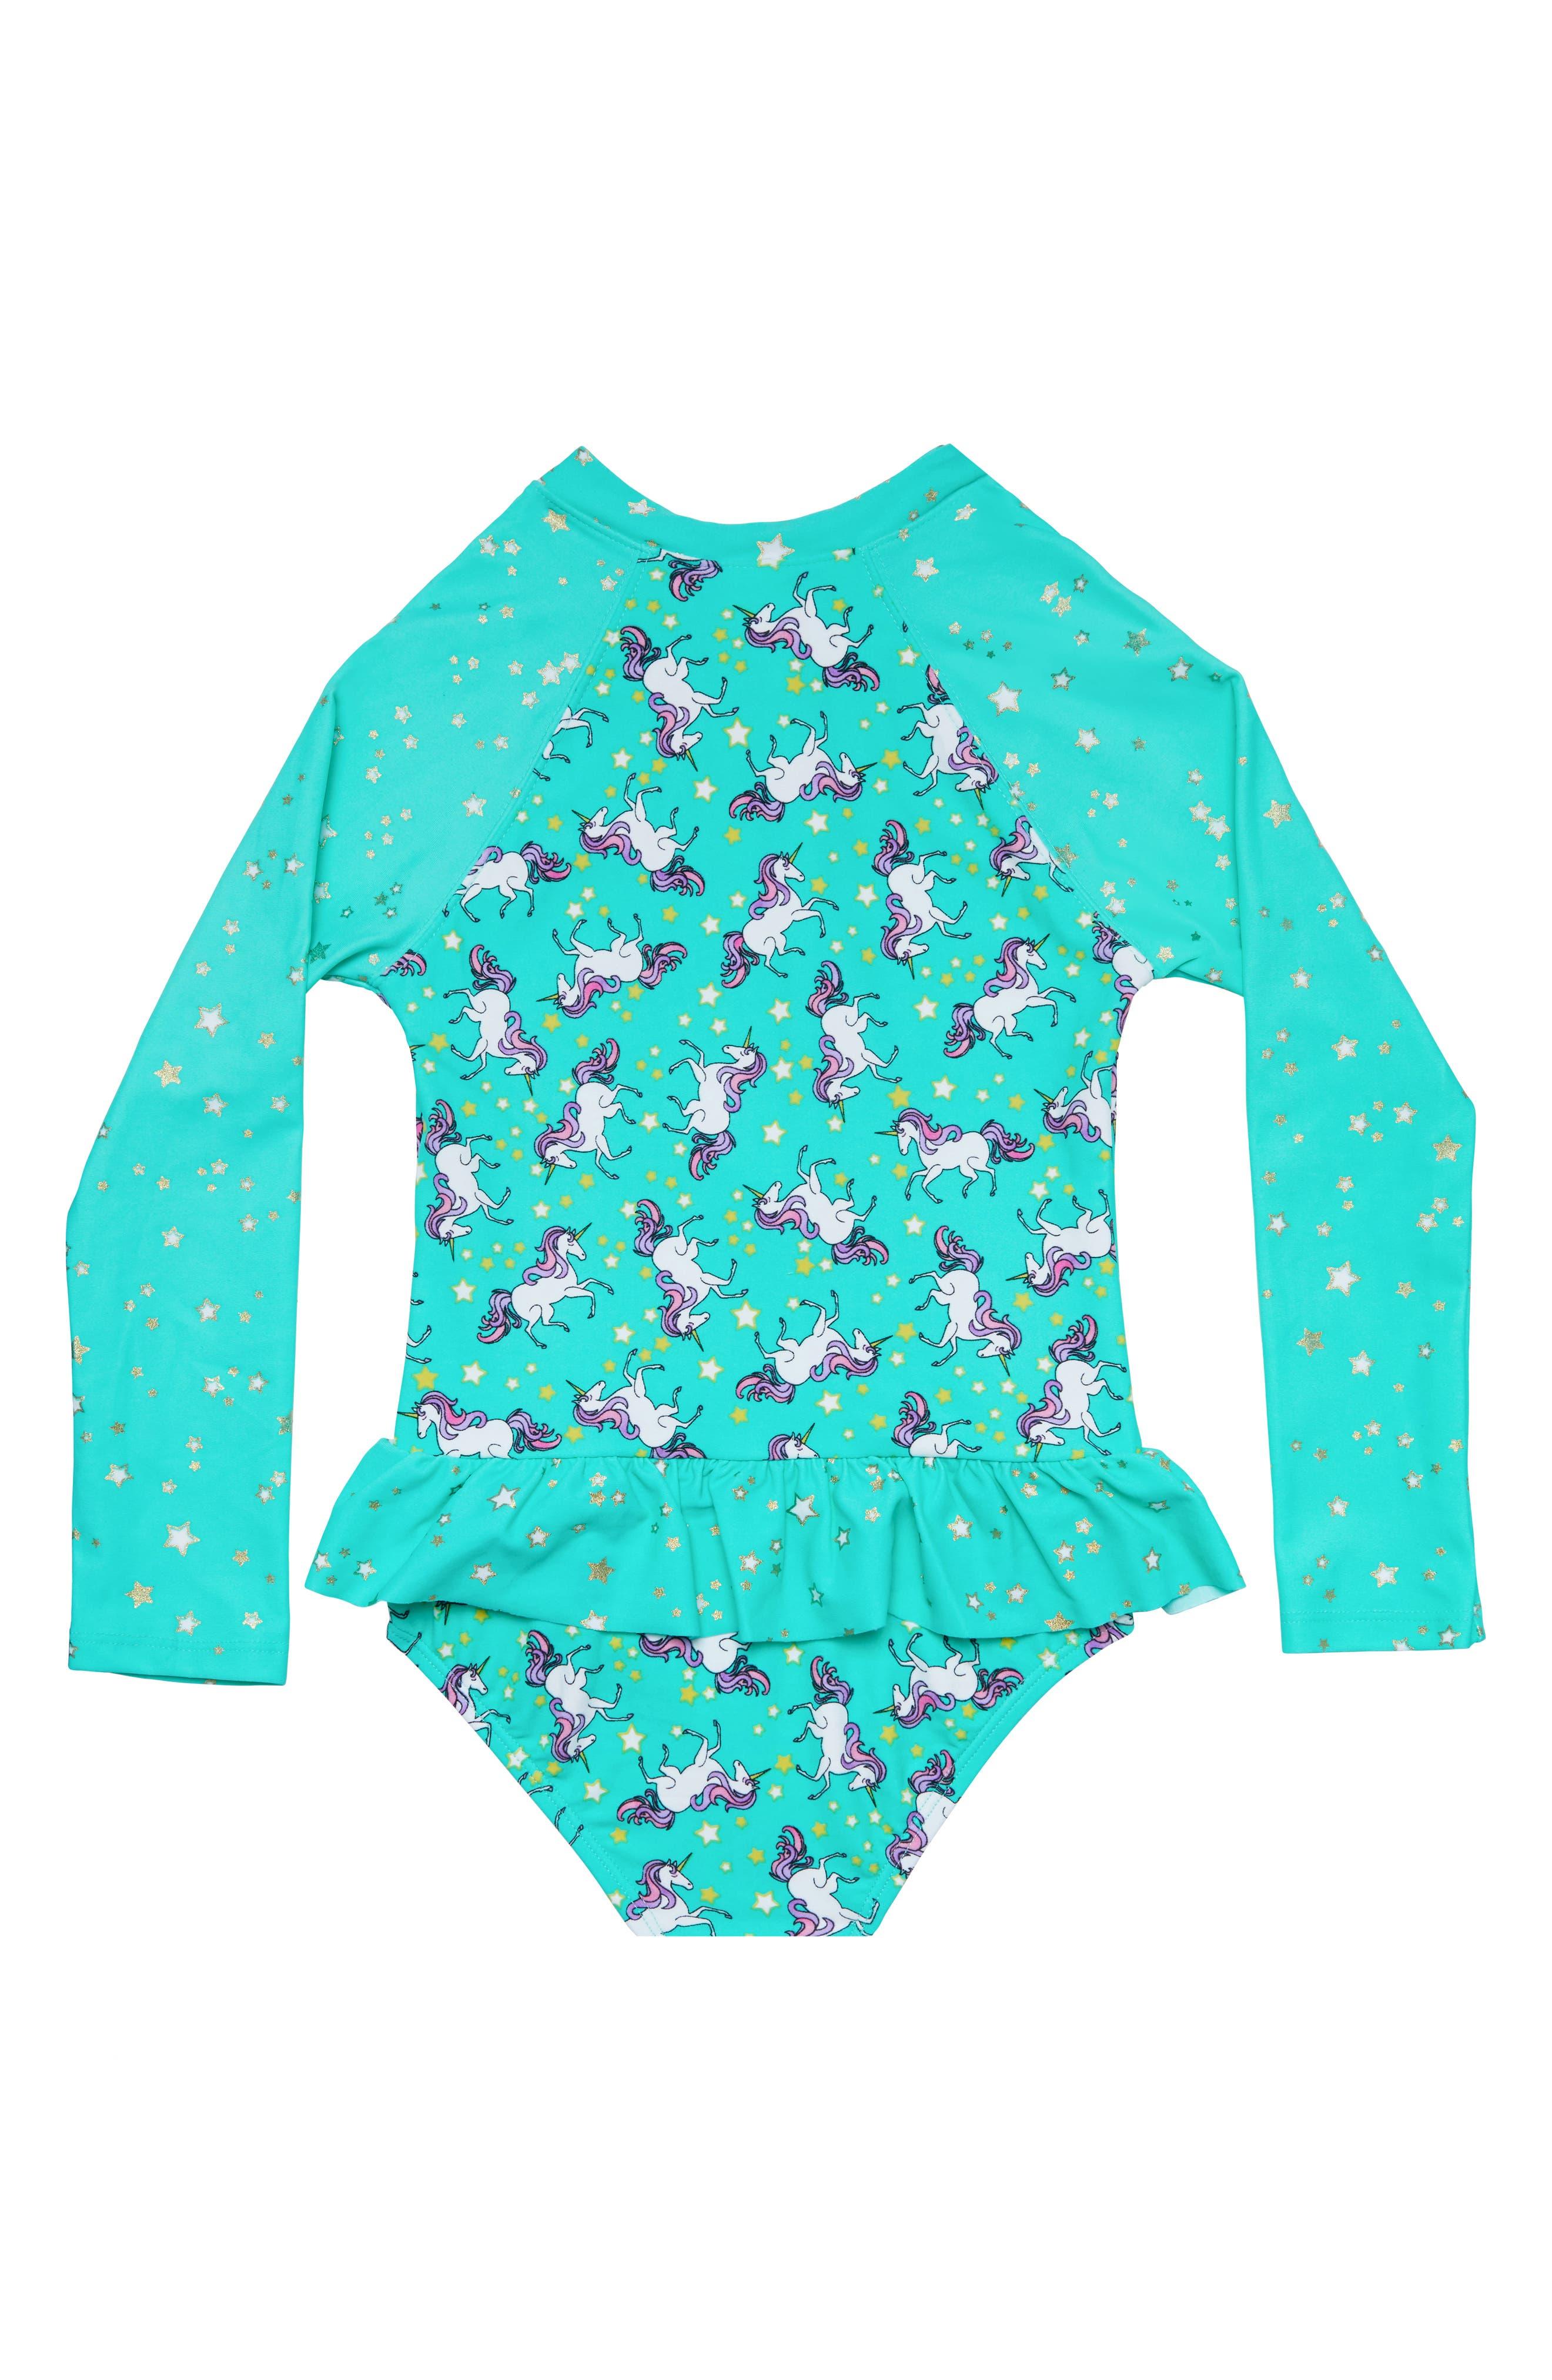 Stardust Dream One-Piece Rashguard Swimsuit,                             Alternate thumbnail 2, color,                             MERMAID BLUE